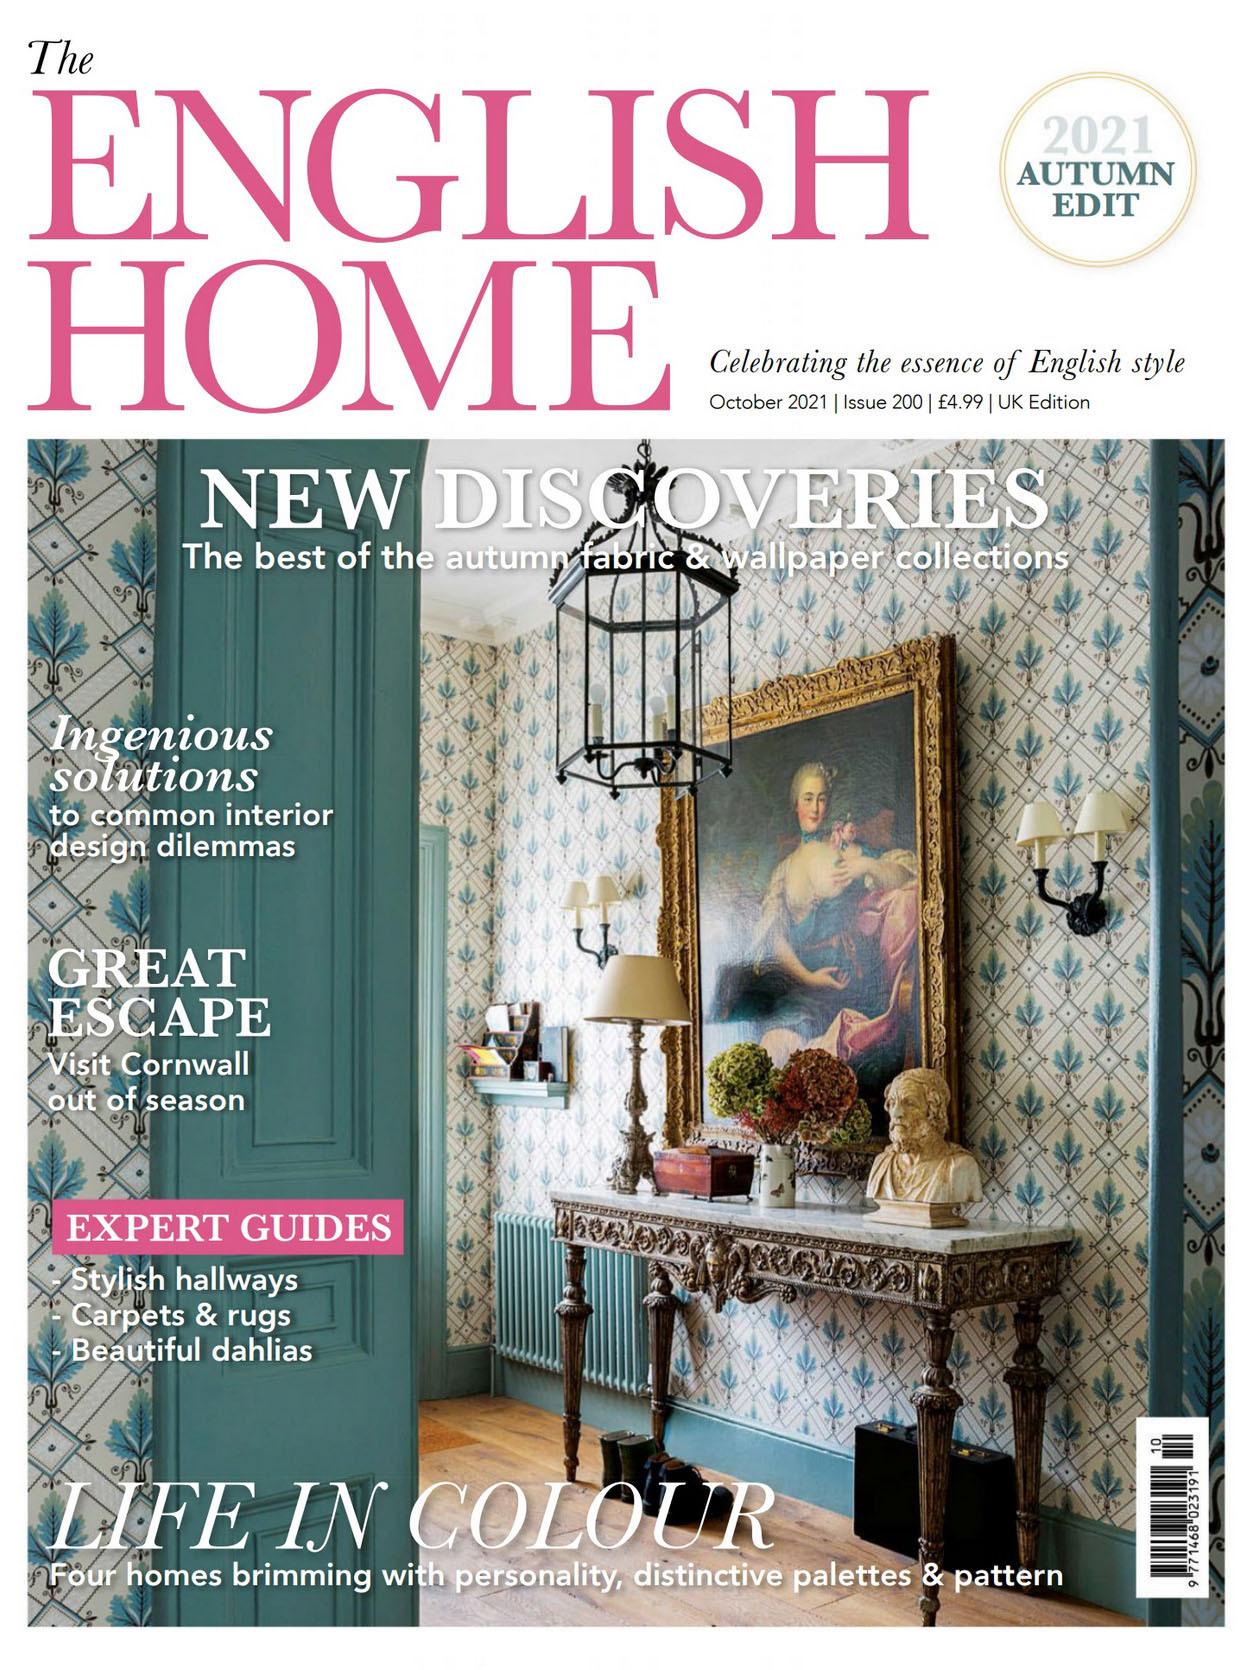 《The English Home》英国版时尚家居杂志2021年10月号